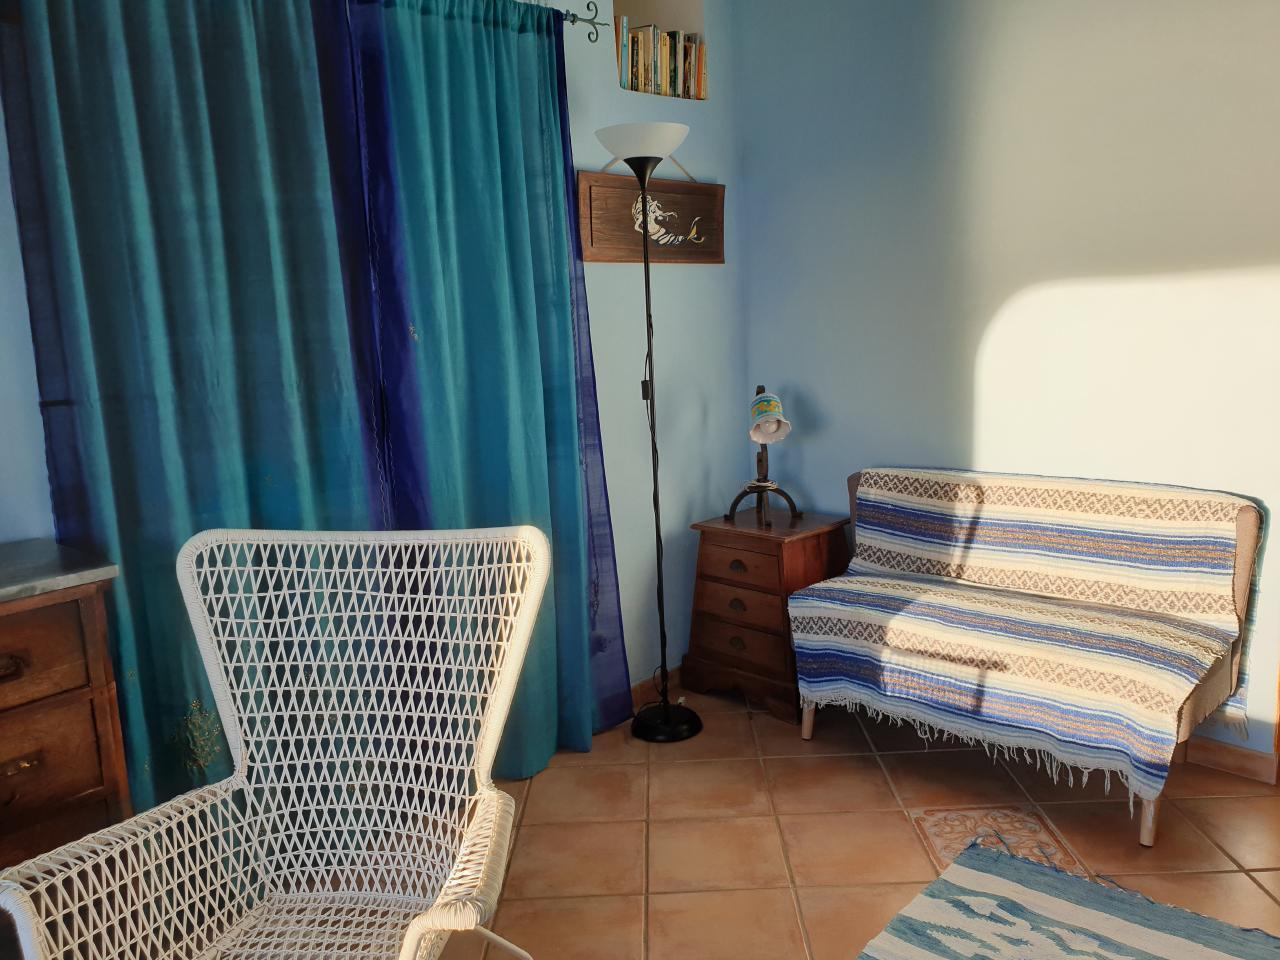 Maison de vacances Casetta Eoliana Lipari Inseln, pool, sauna. (827872), Lipari, Lipari, Sicile, Italie, image 18